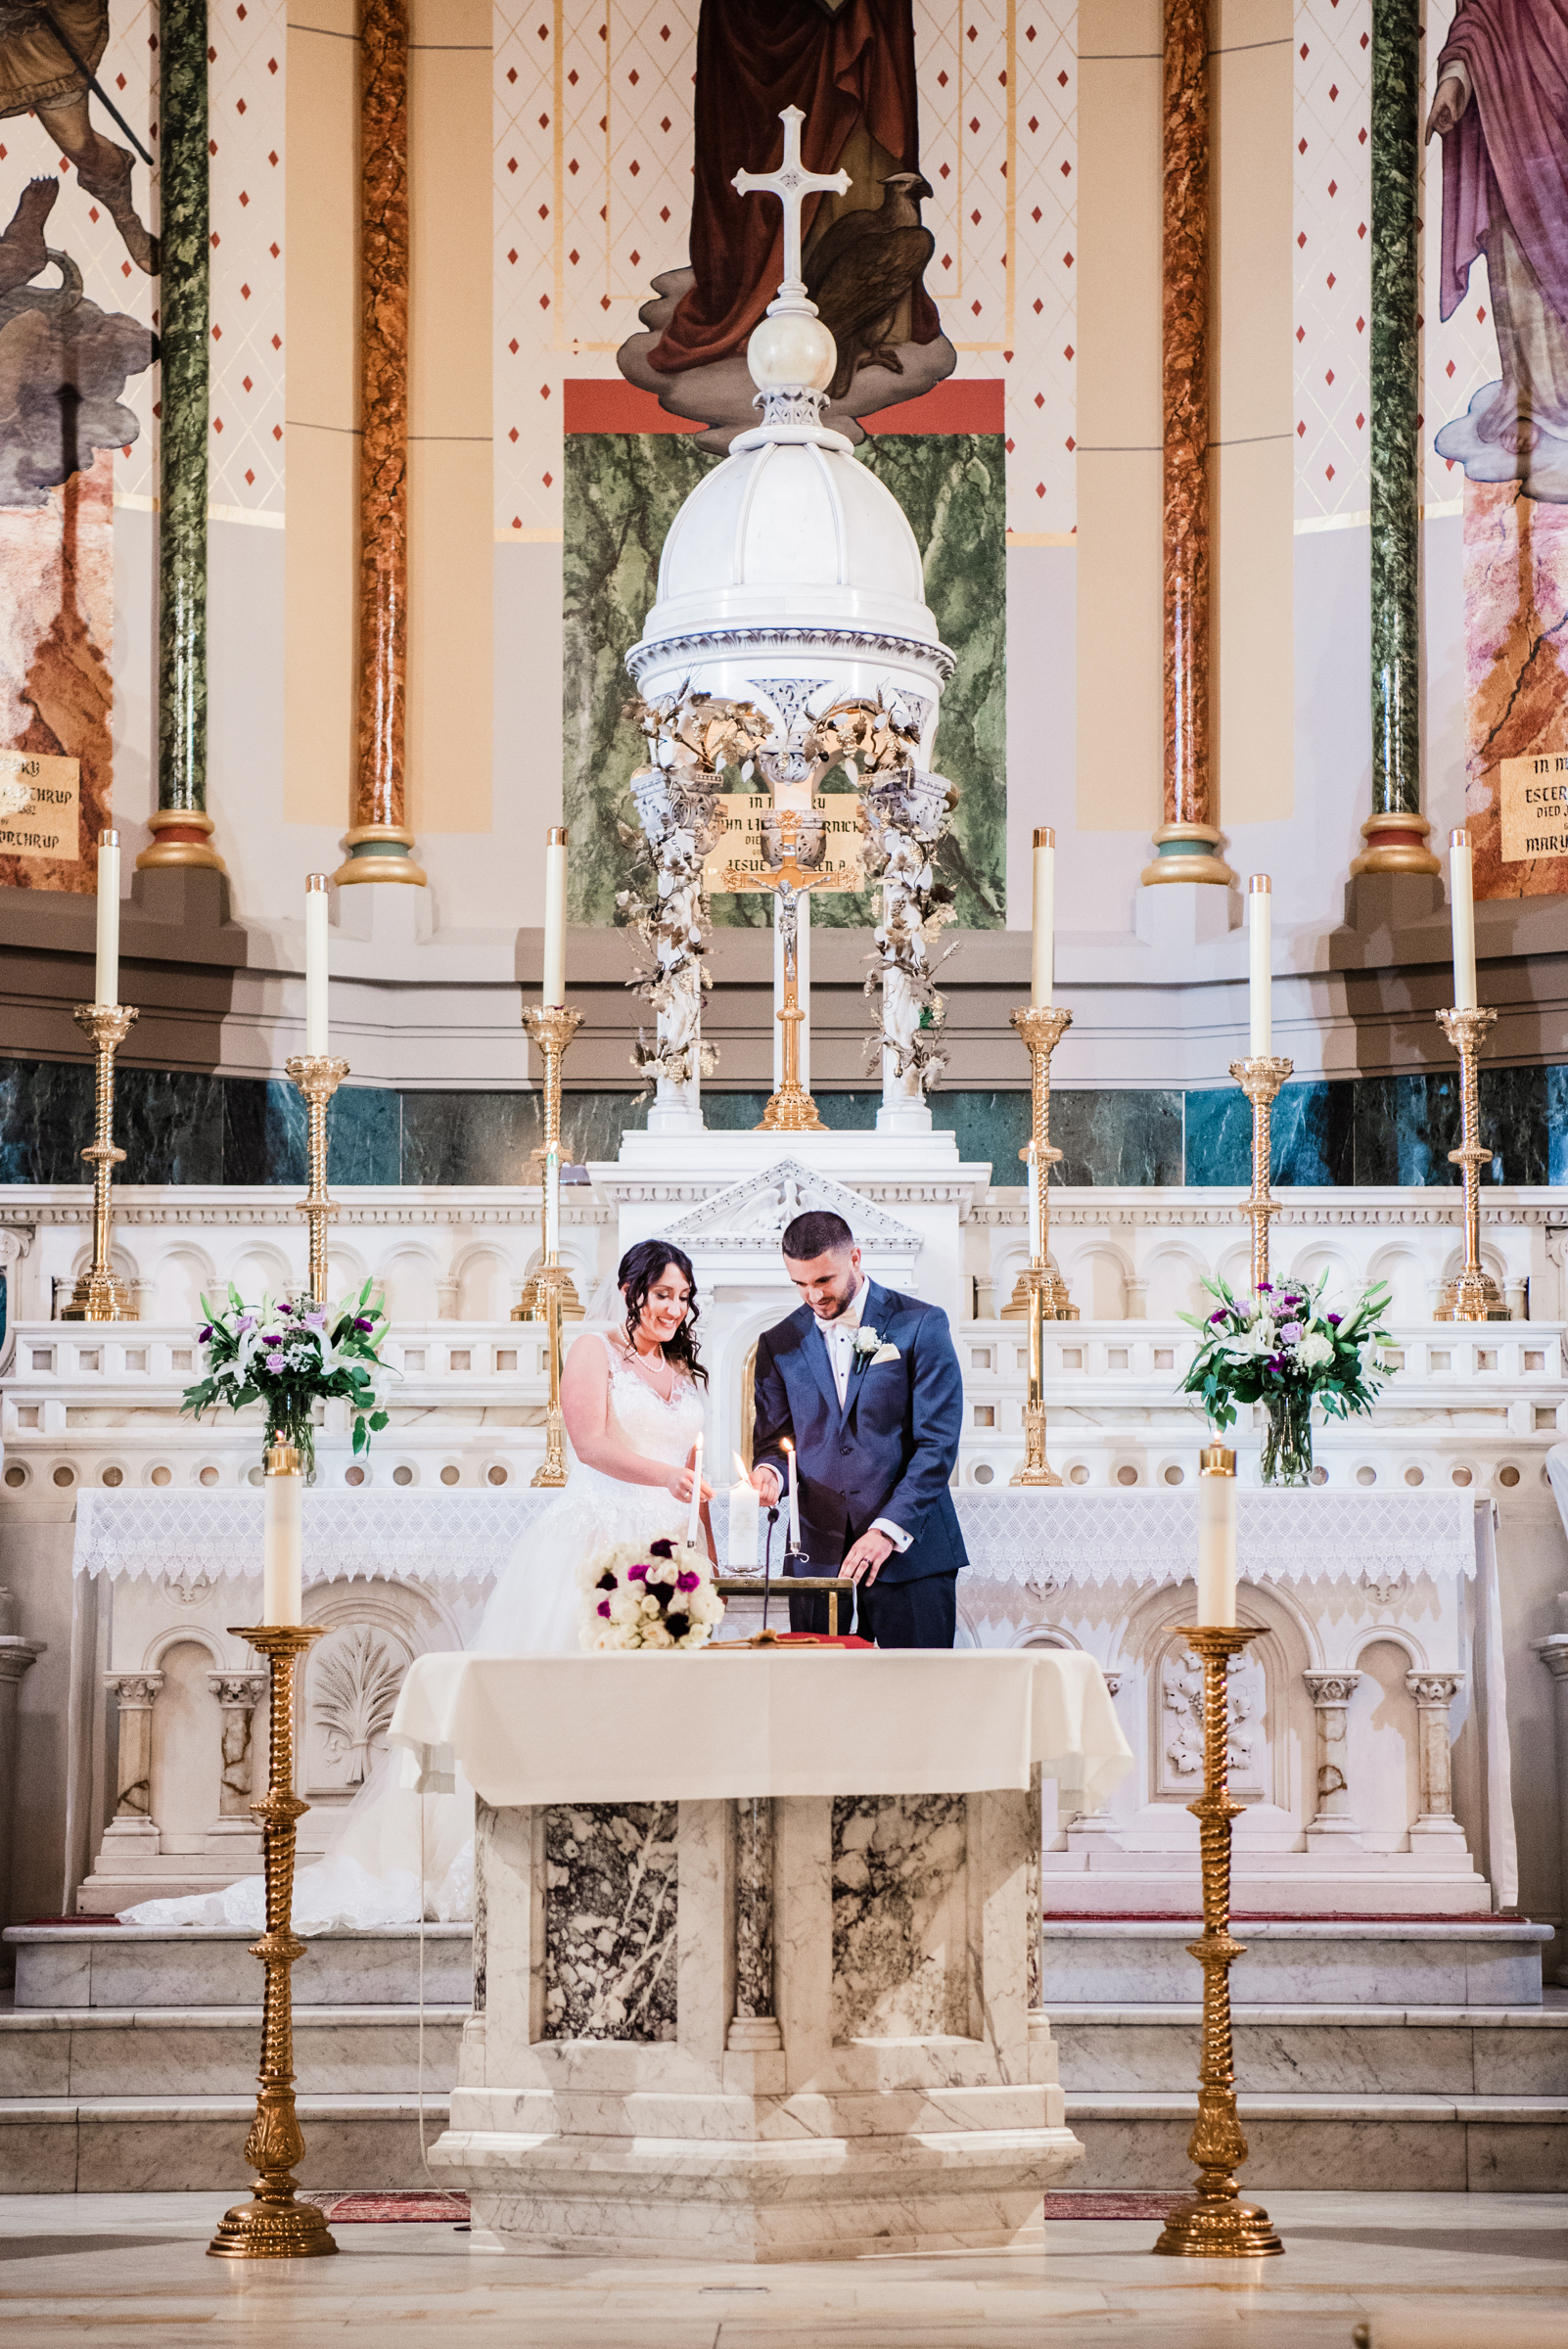 Historic_Old_St_Johns_Church_Valentinos_Banquet_Hall_Central_NY_Wedding_JILL_STUDIO_Rochester_NY_Photographer_DSC_5800.jpg